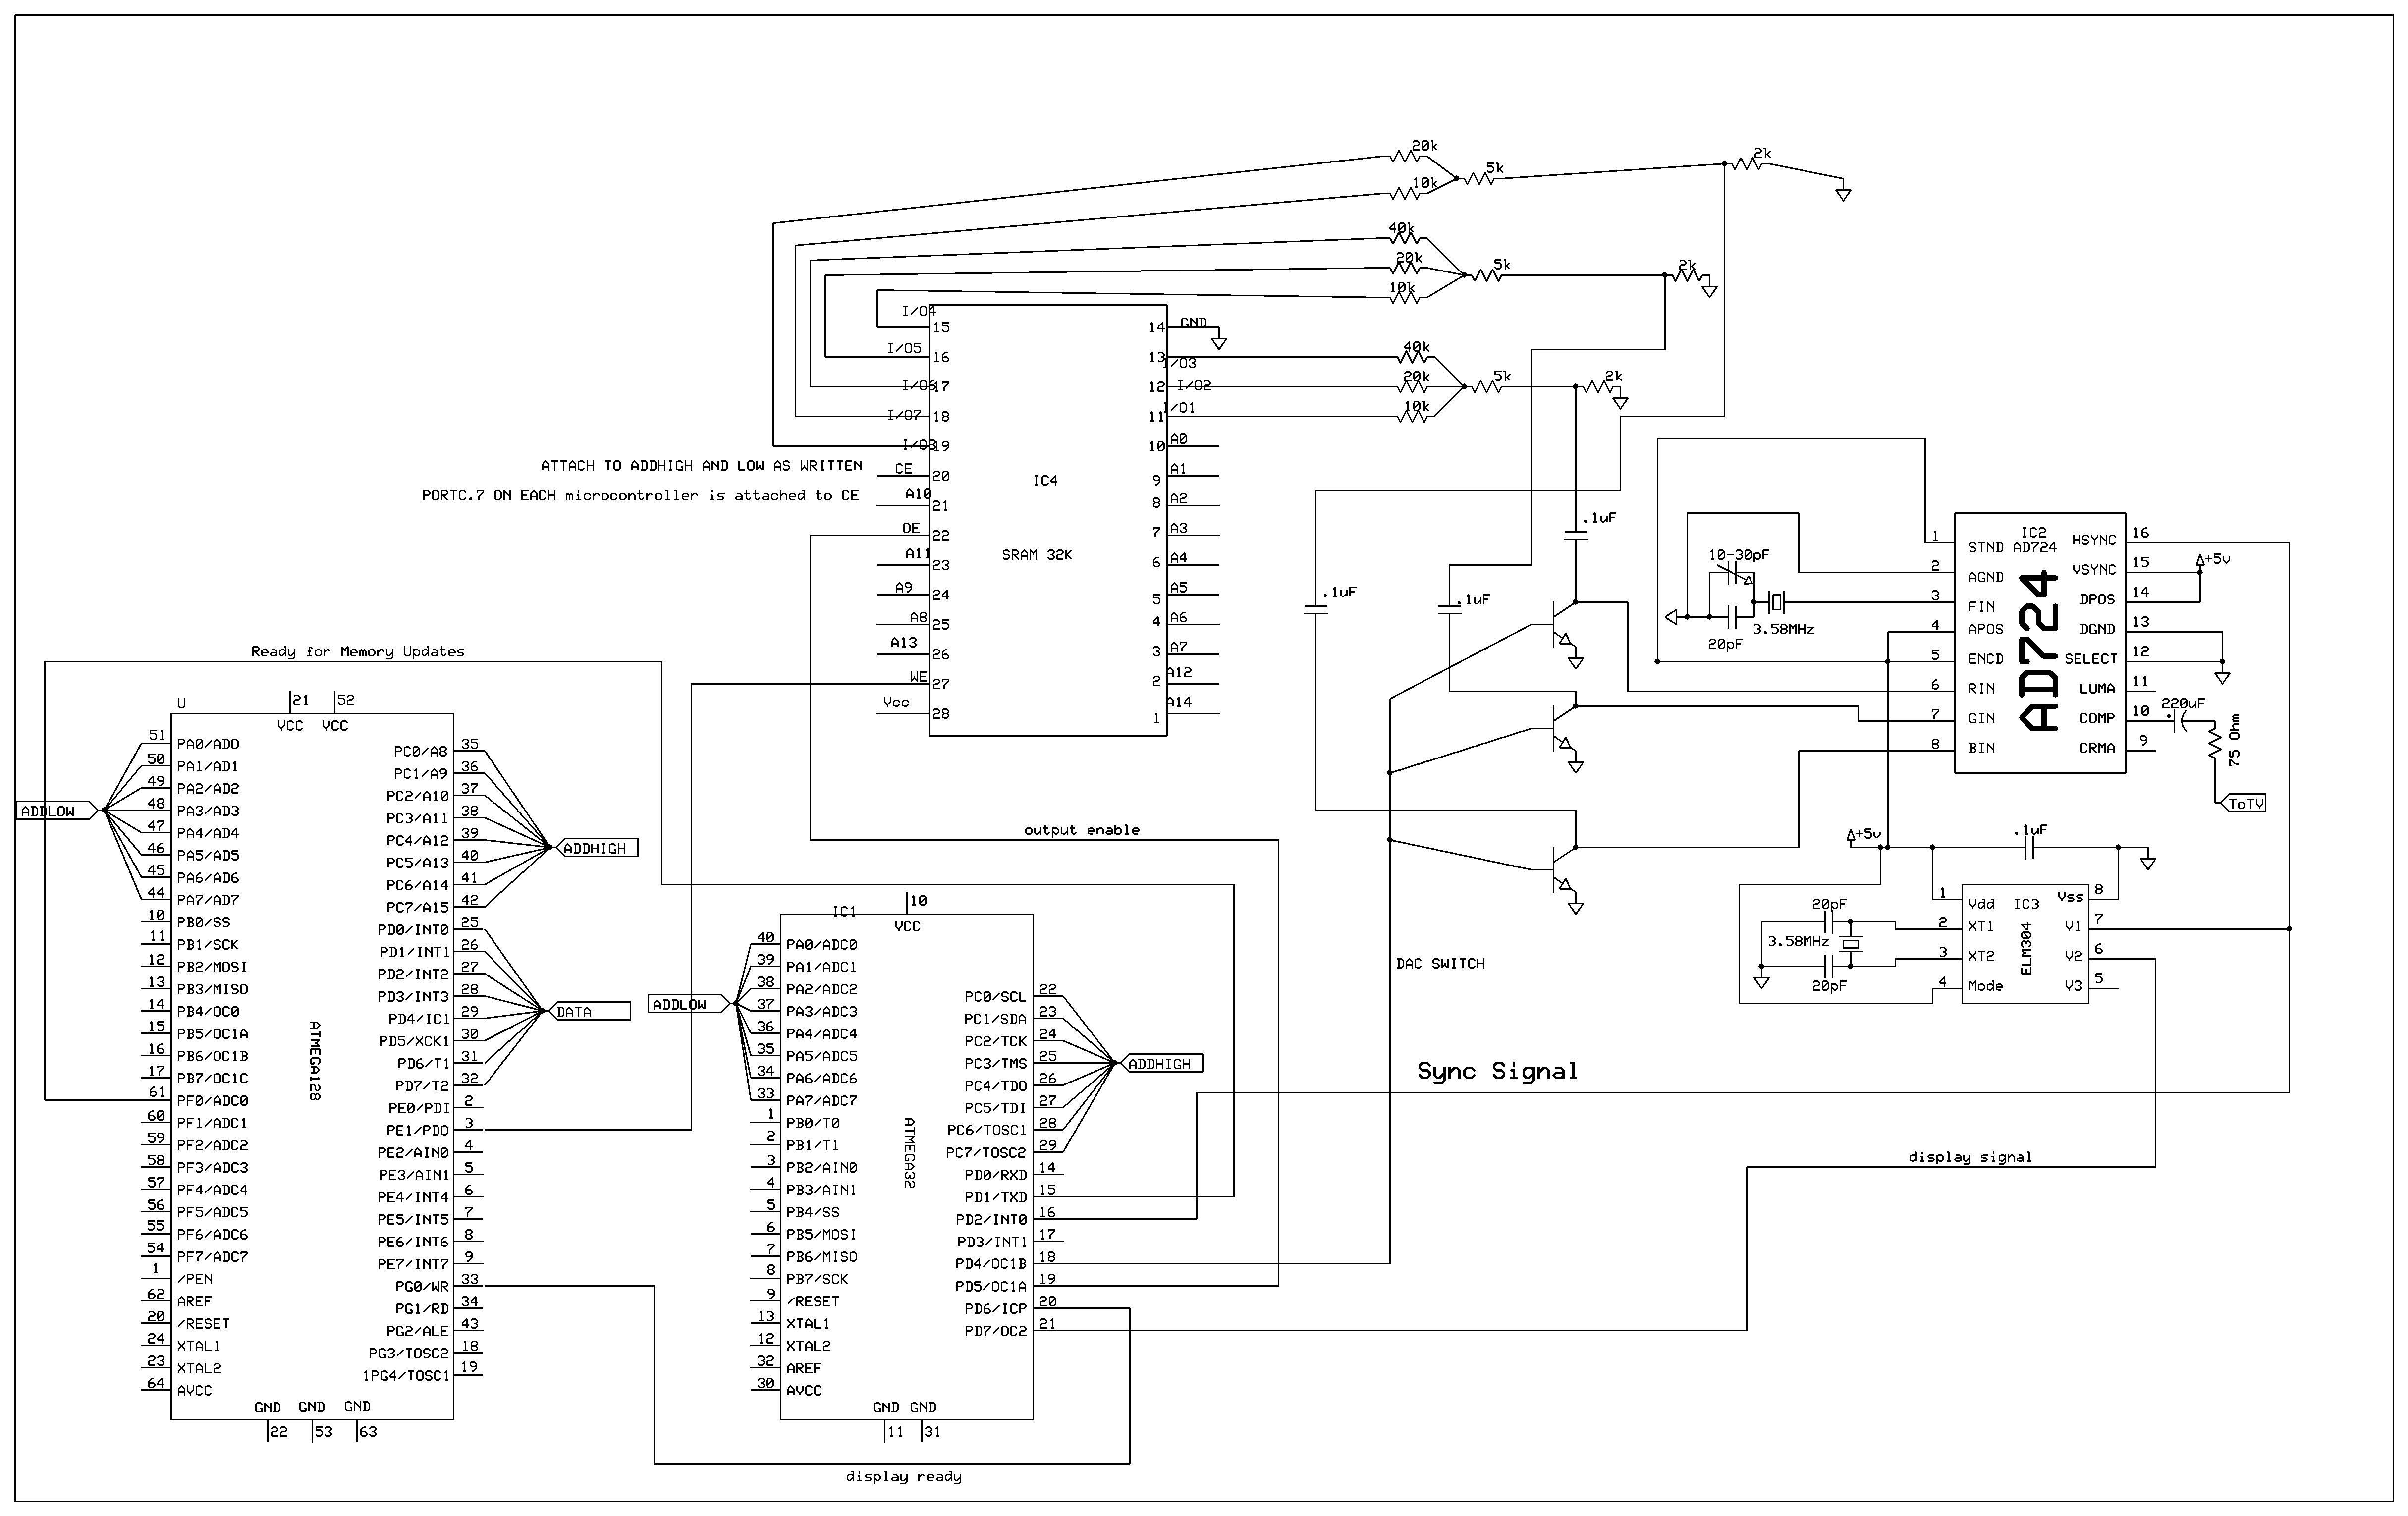 pacman wiring diagram pacman wiring diagrams pacman wiring diagram